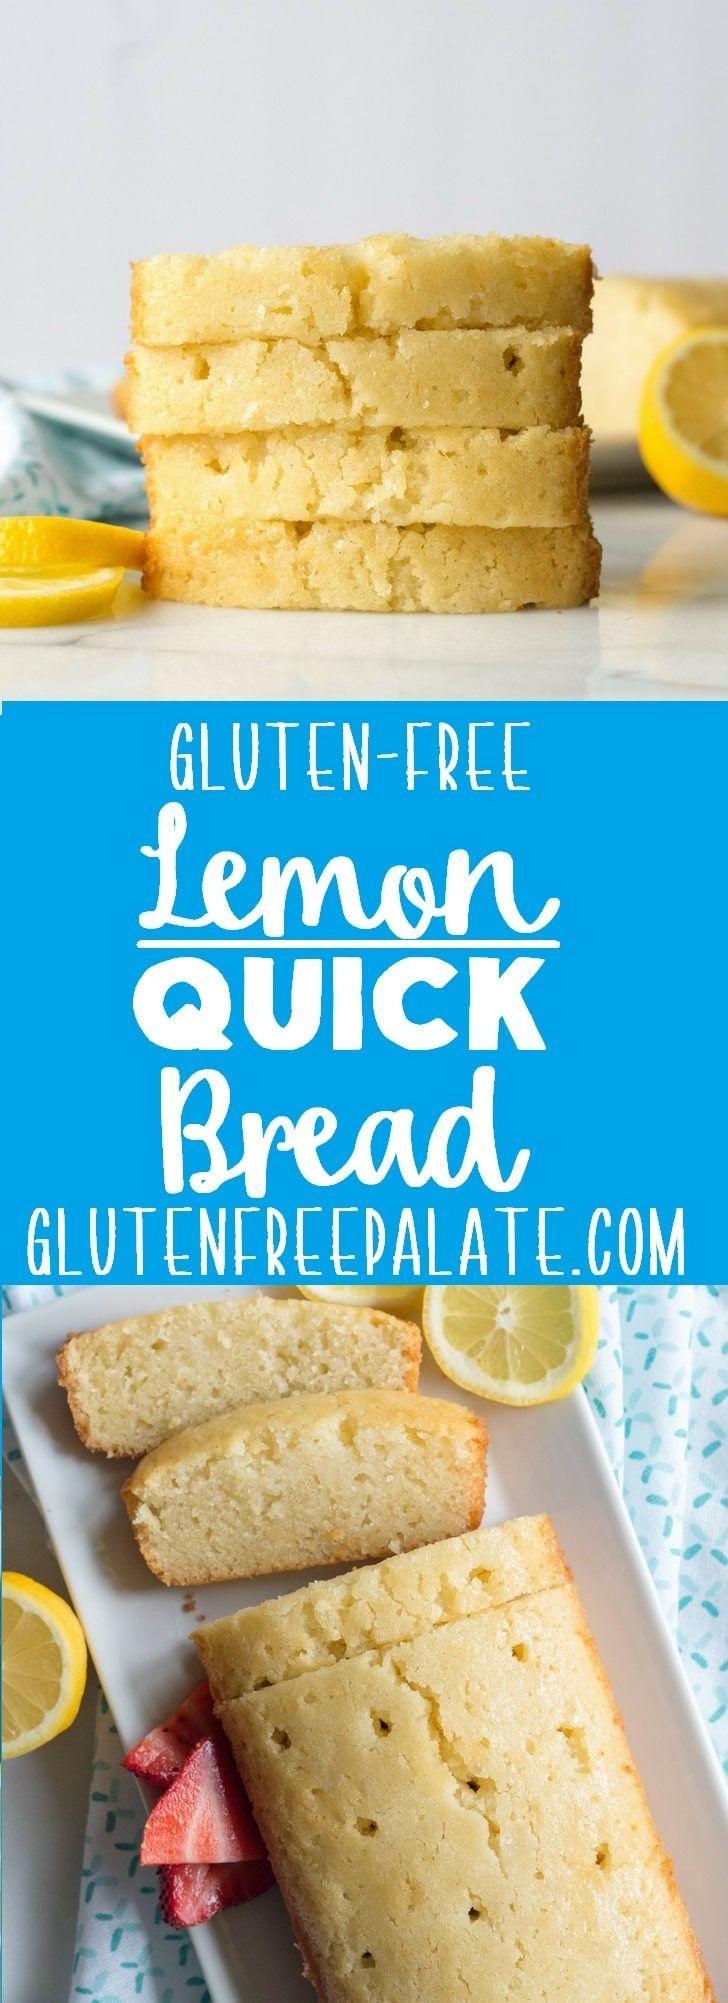 6591 best Gluten Free Eats images on Pinterest | Keto recipes ...